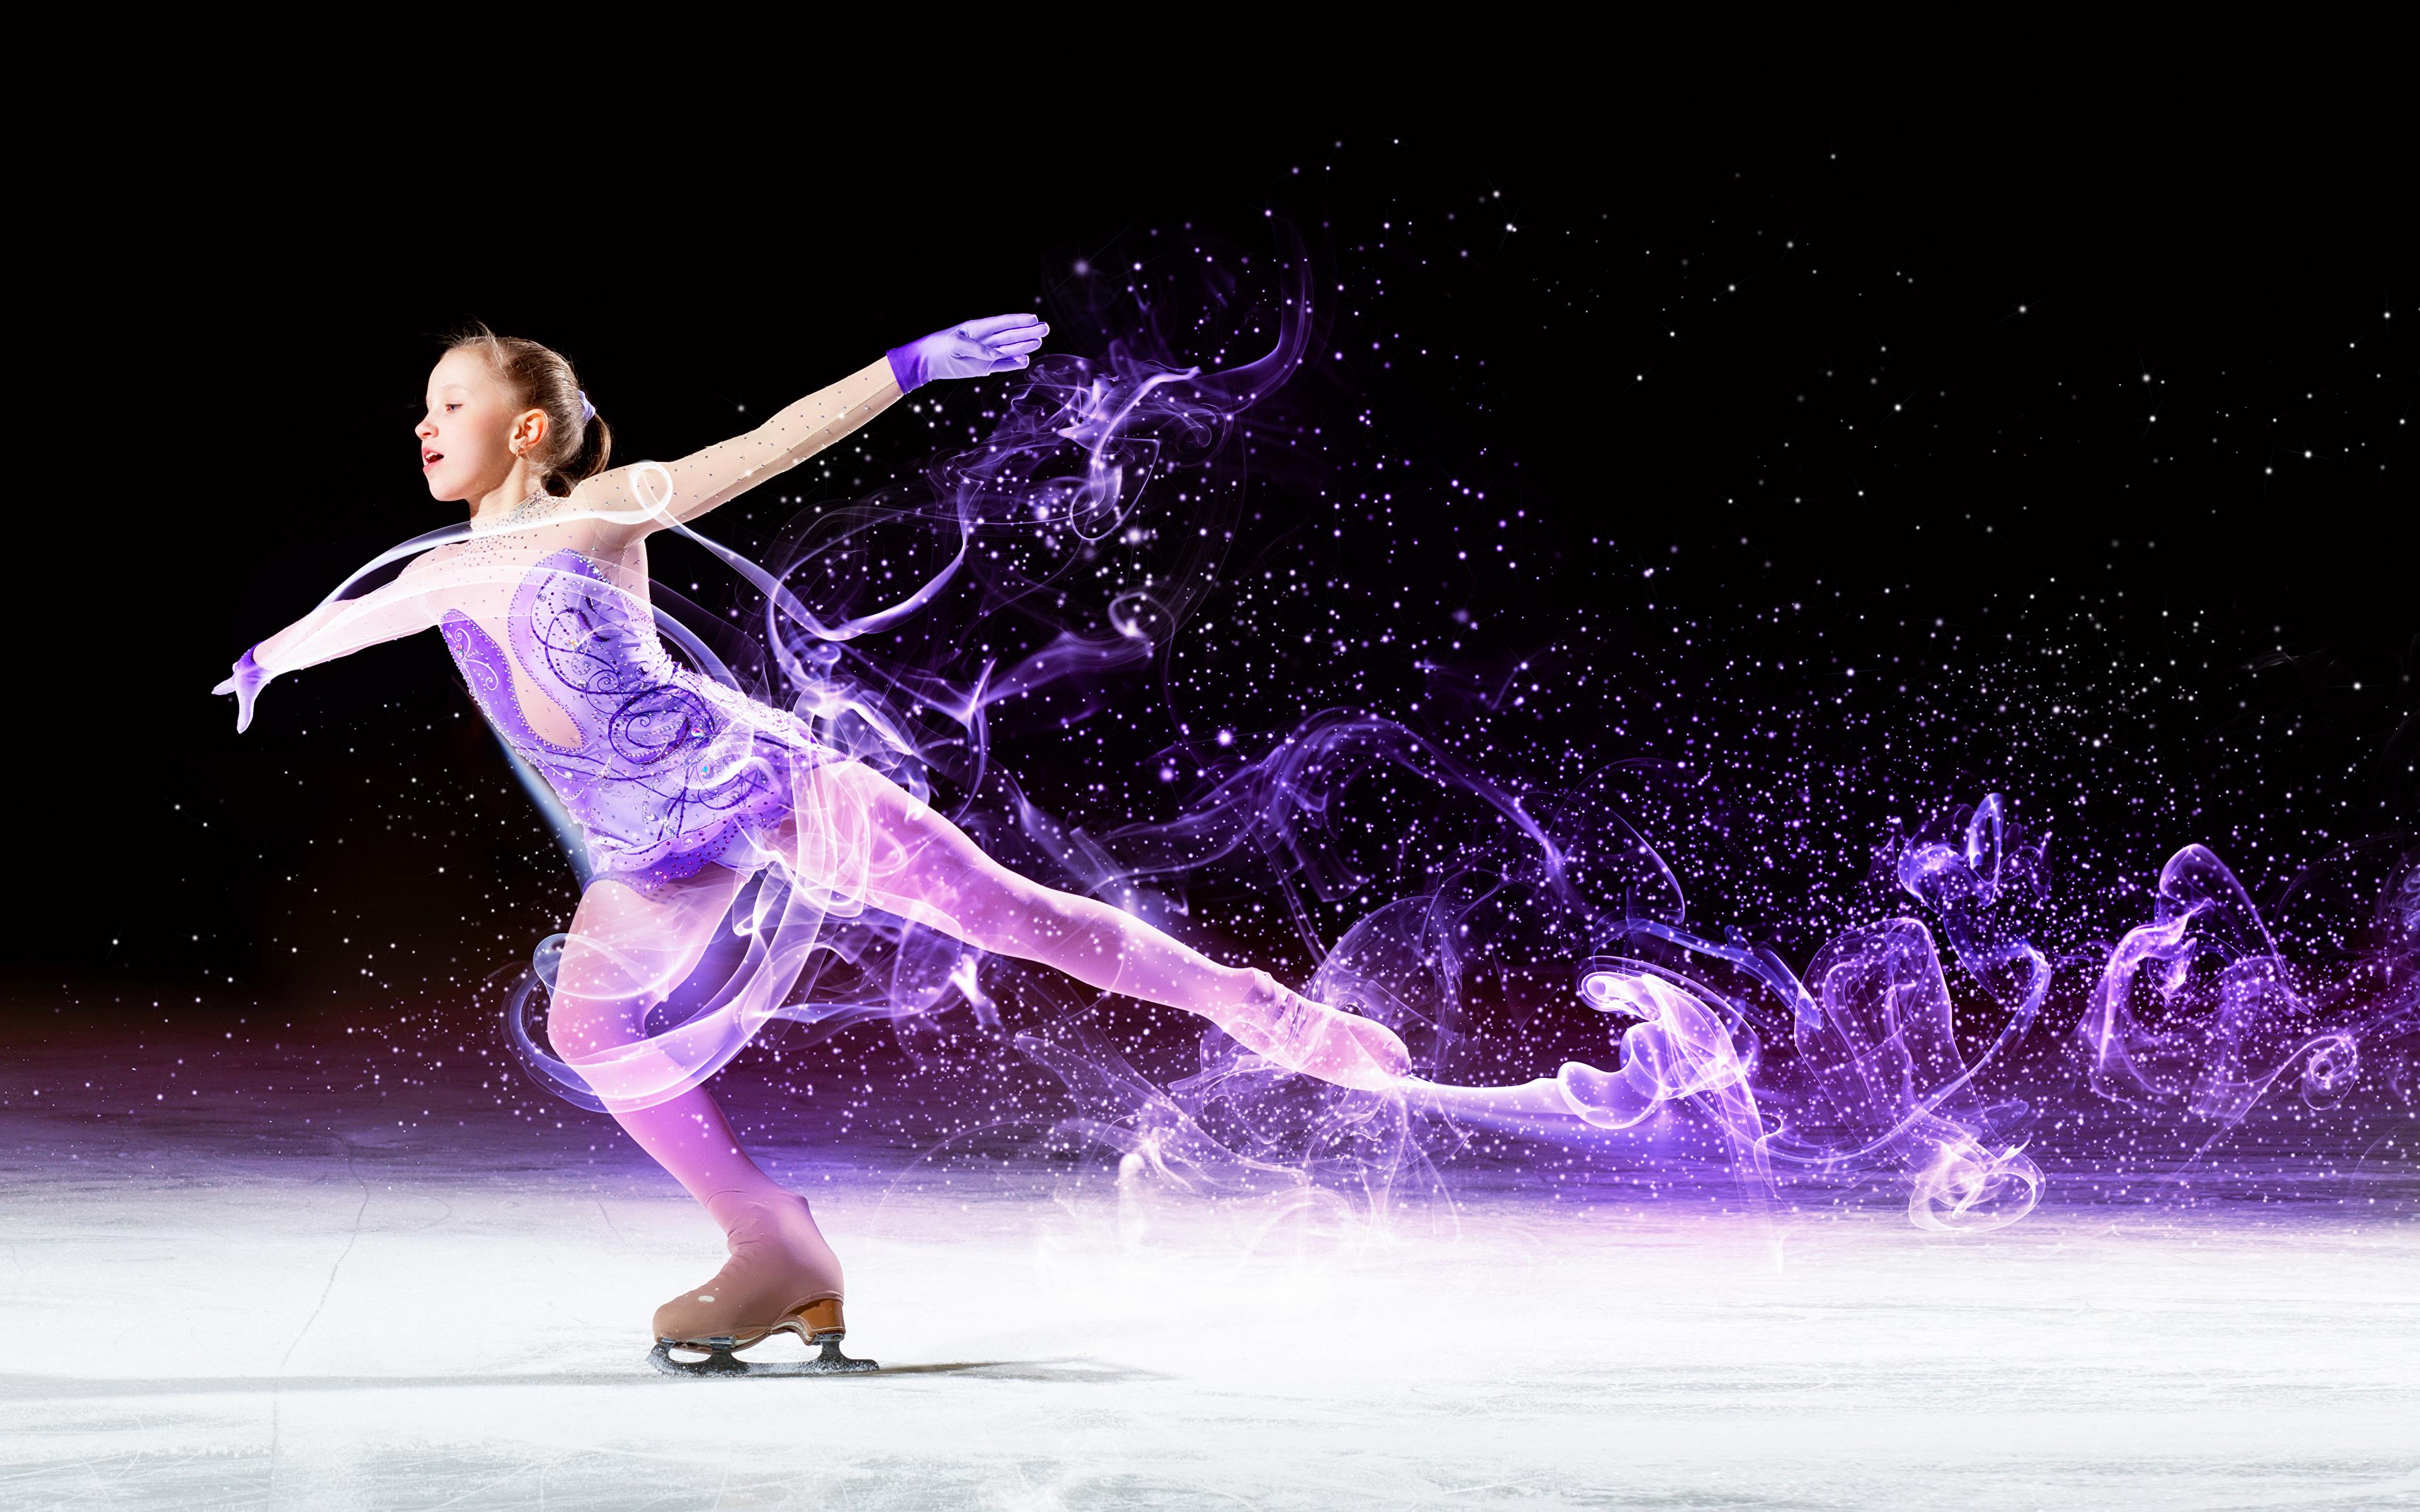 Image Little Girls Ice Skate Dancing Ice Children Athletic 3840x2400